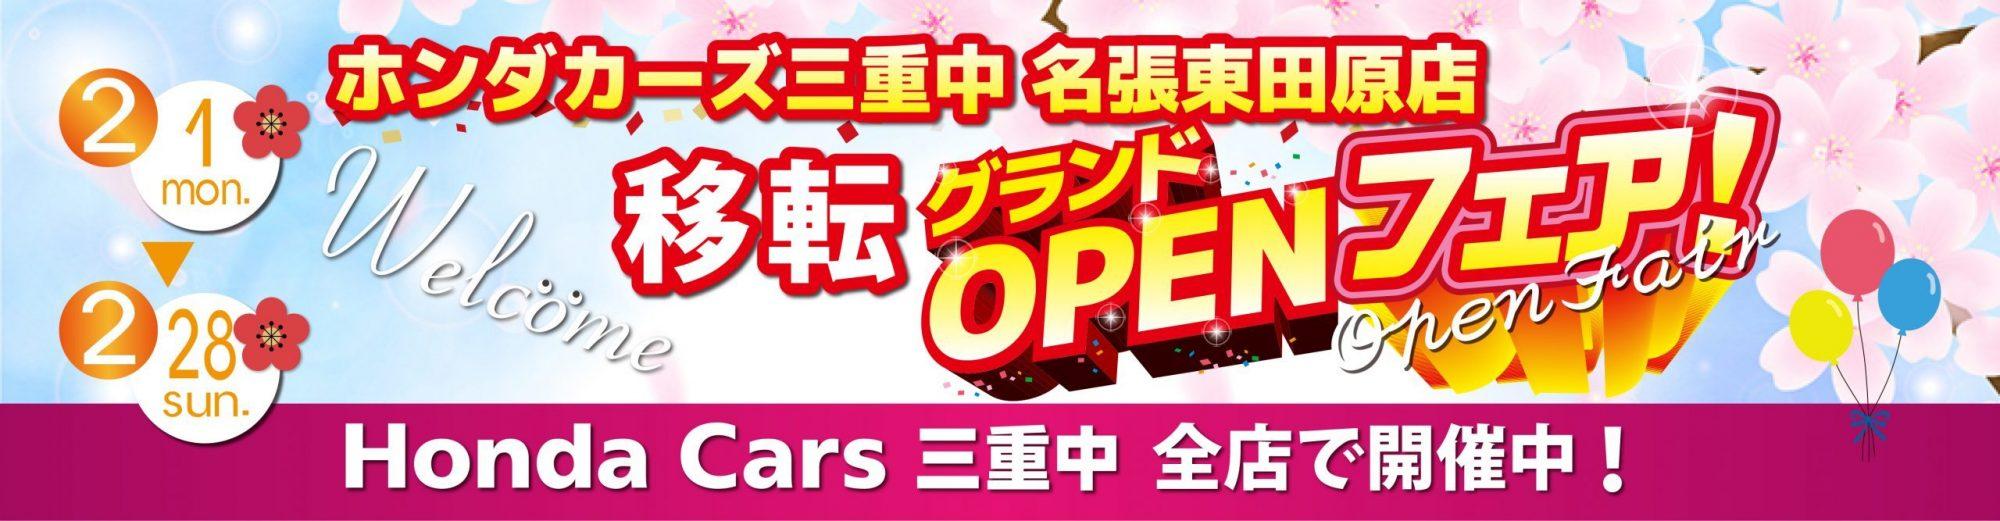 Honda Cars 三重中 名張東田原店 移転グランドオープンフェア×決算